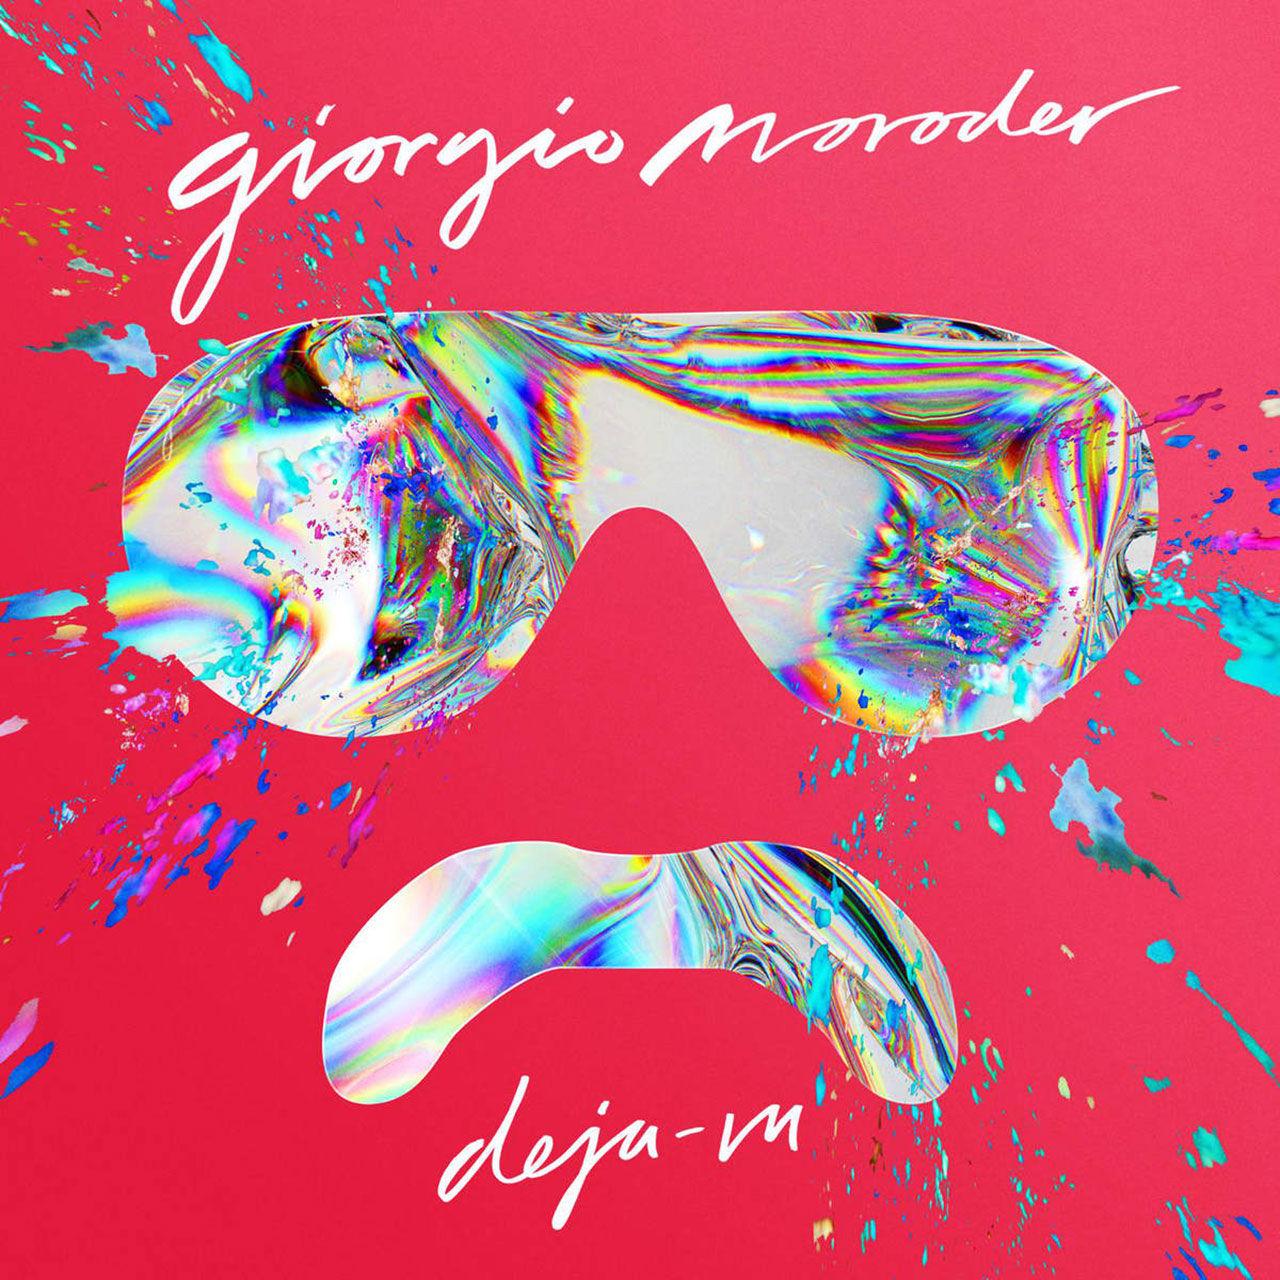 Strömma Giorgio Moroders nya album